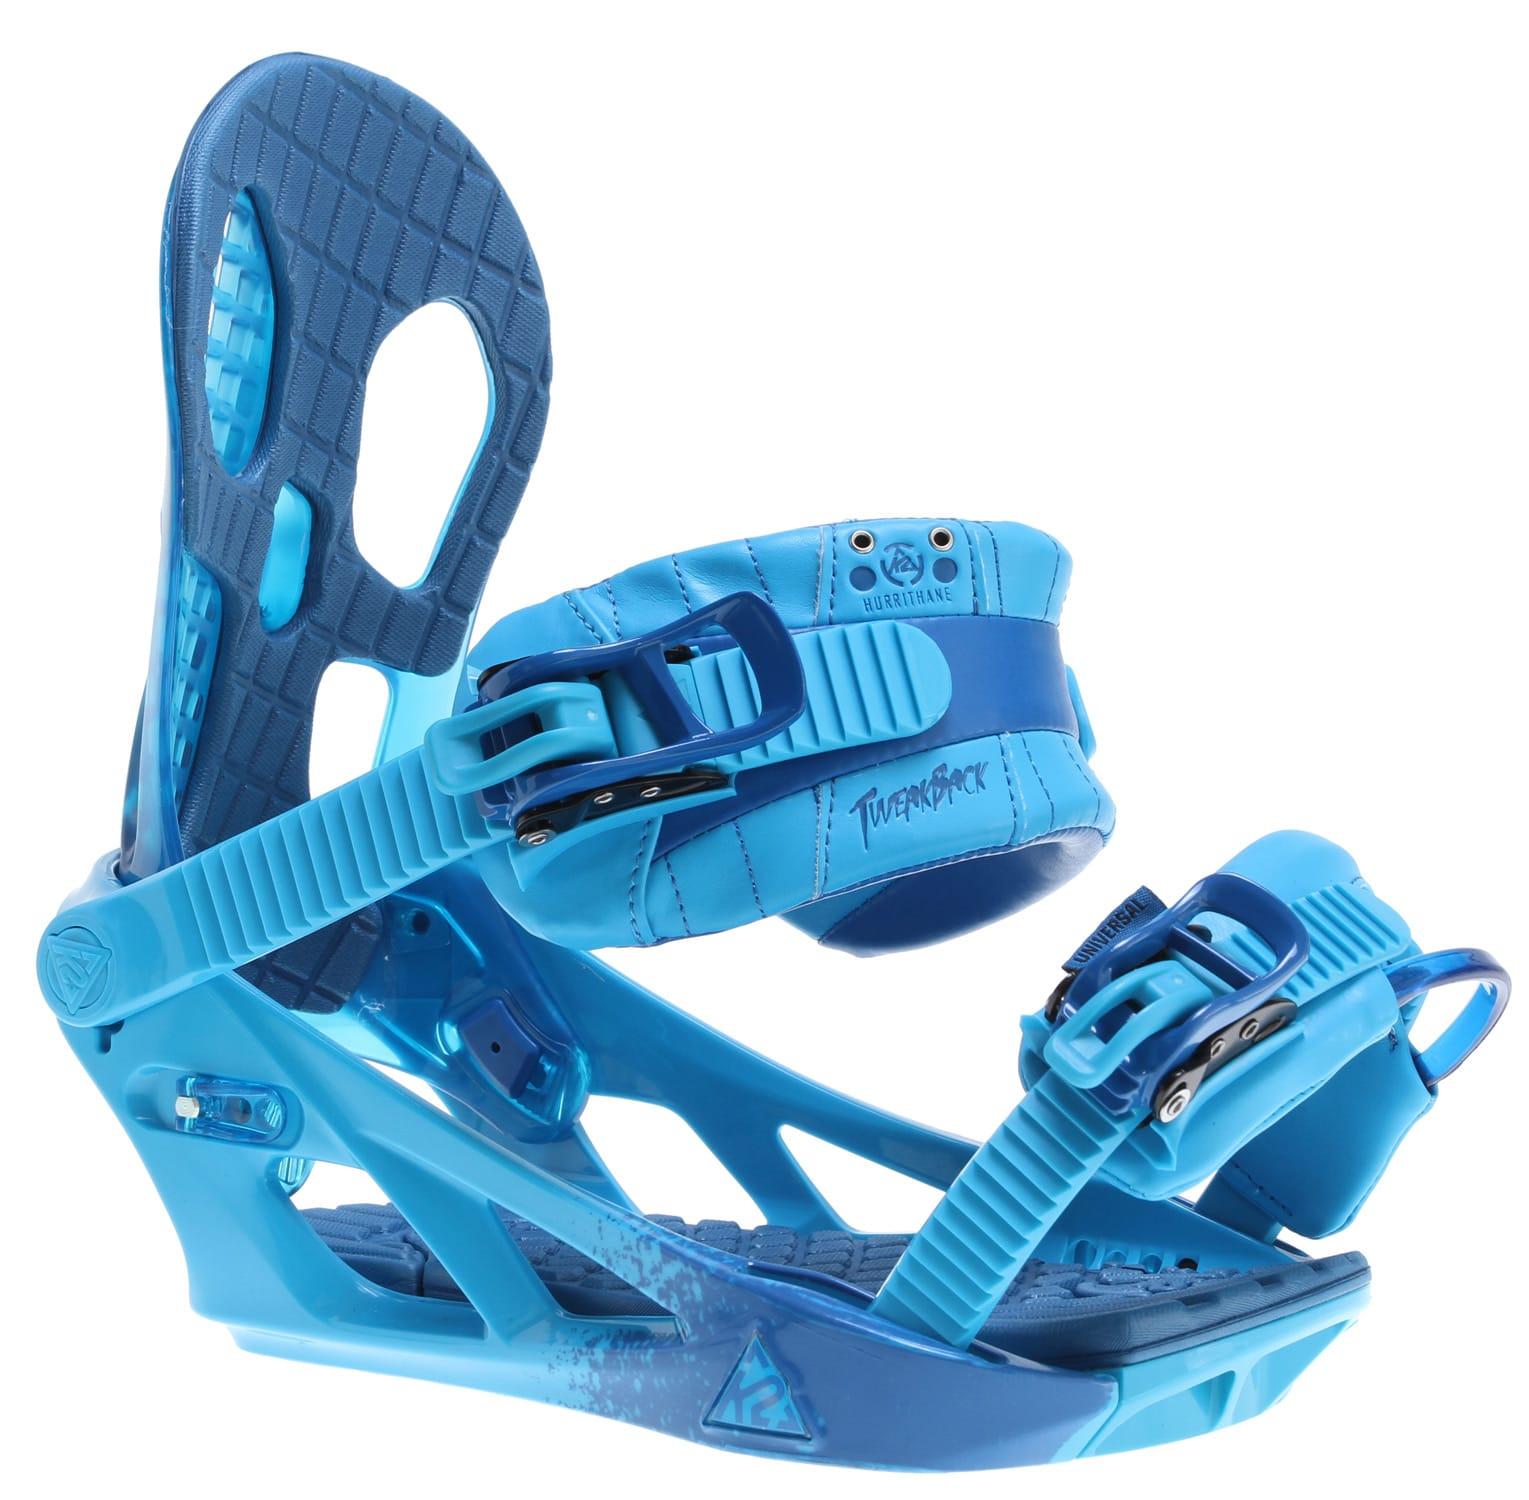 K2 Hurrithane Snowboard Bindings Blue Mens Sz M (5-8)